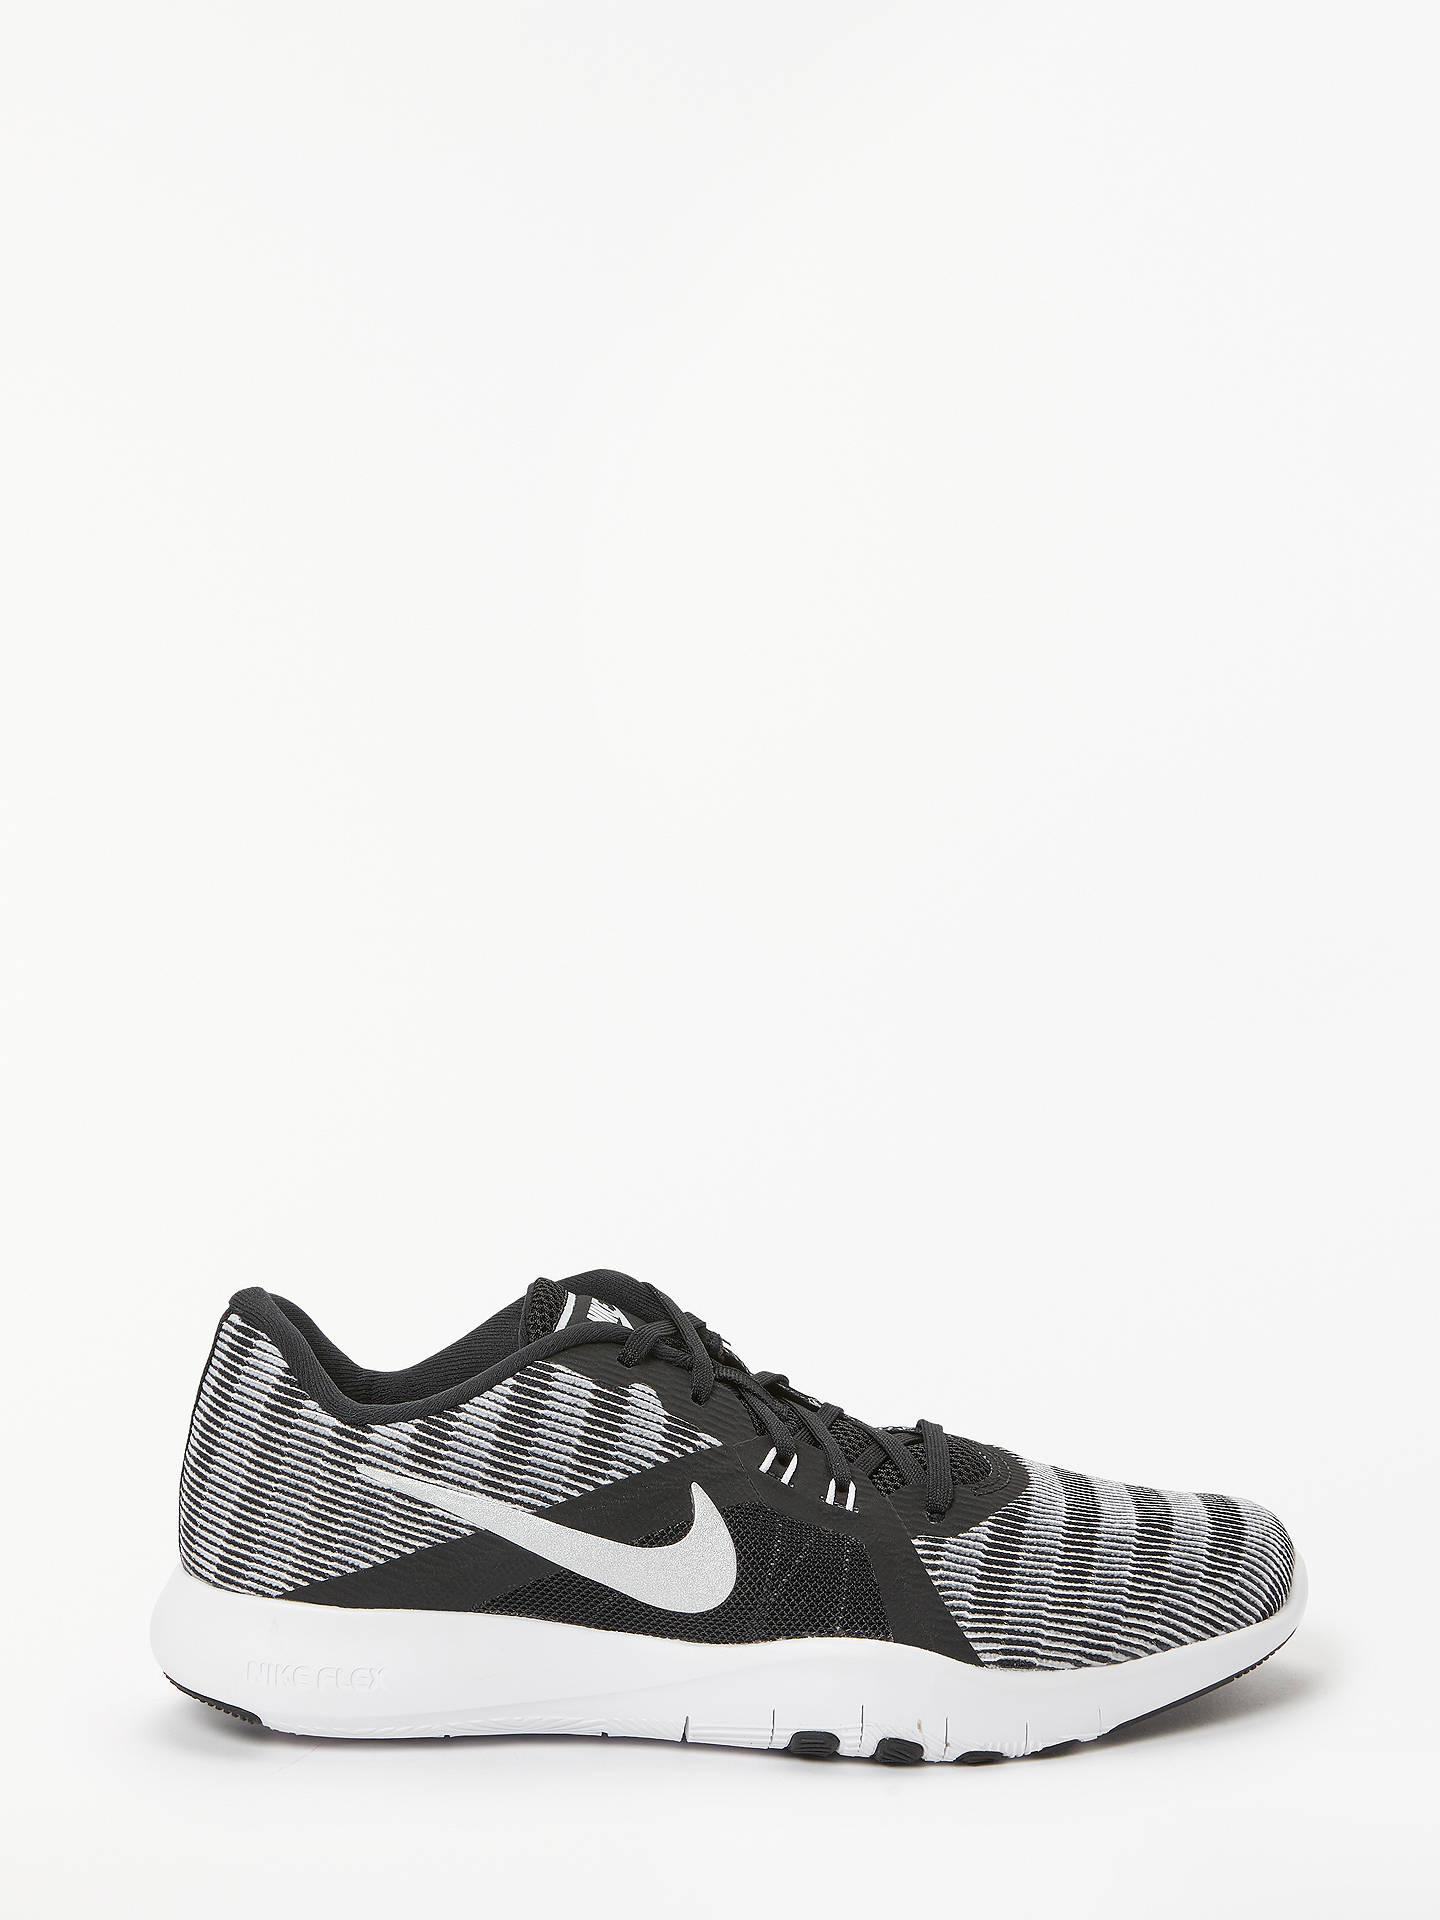 f1eabfee57e1 Nike Flex TR 8 Women s Training Shoes at John Lewis   Partners